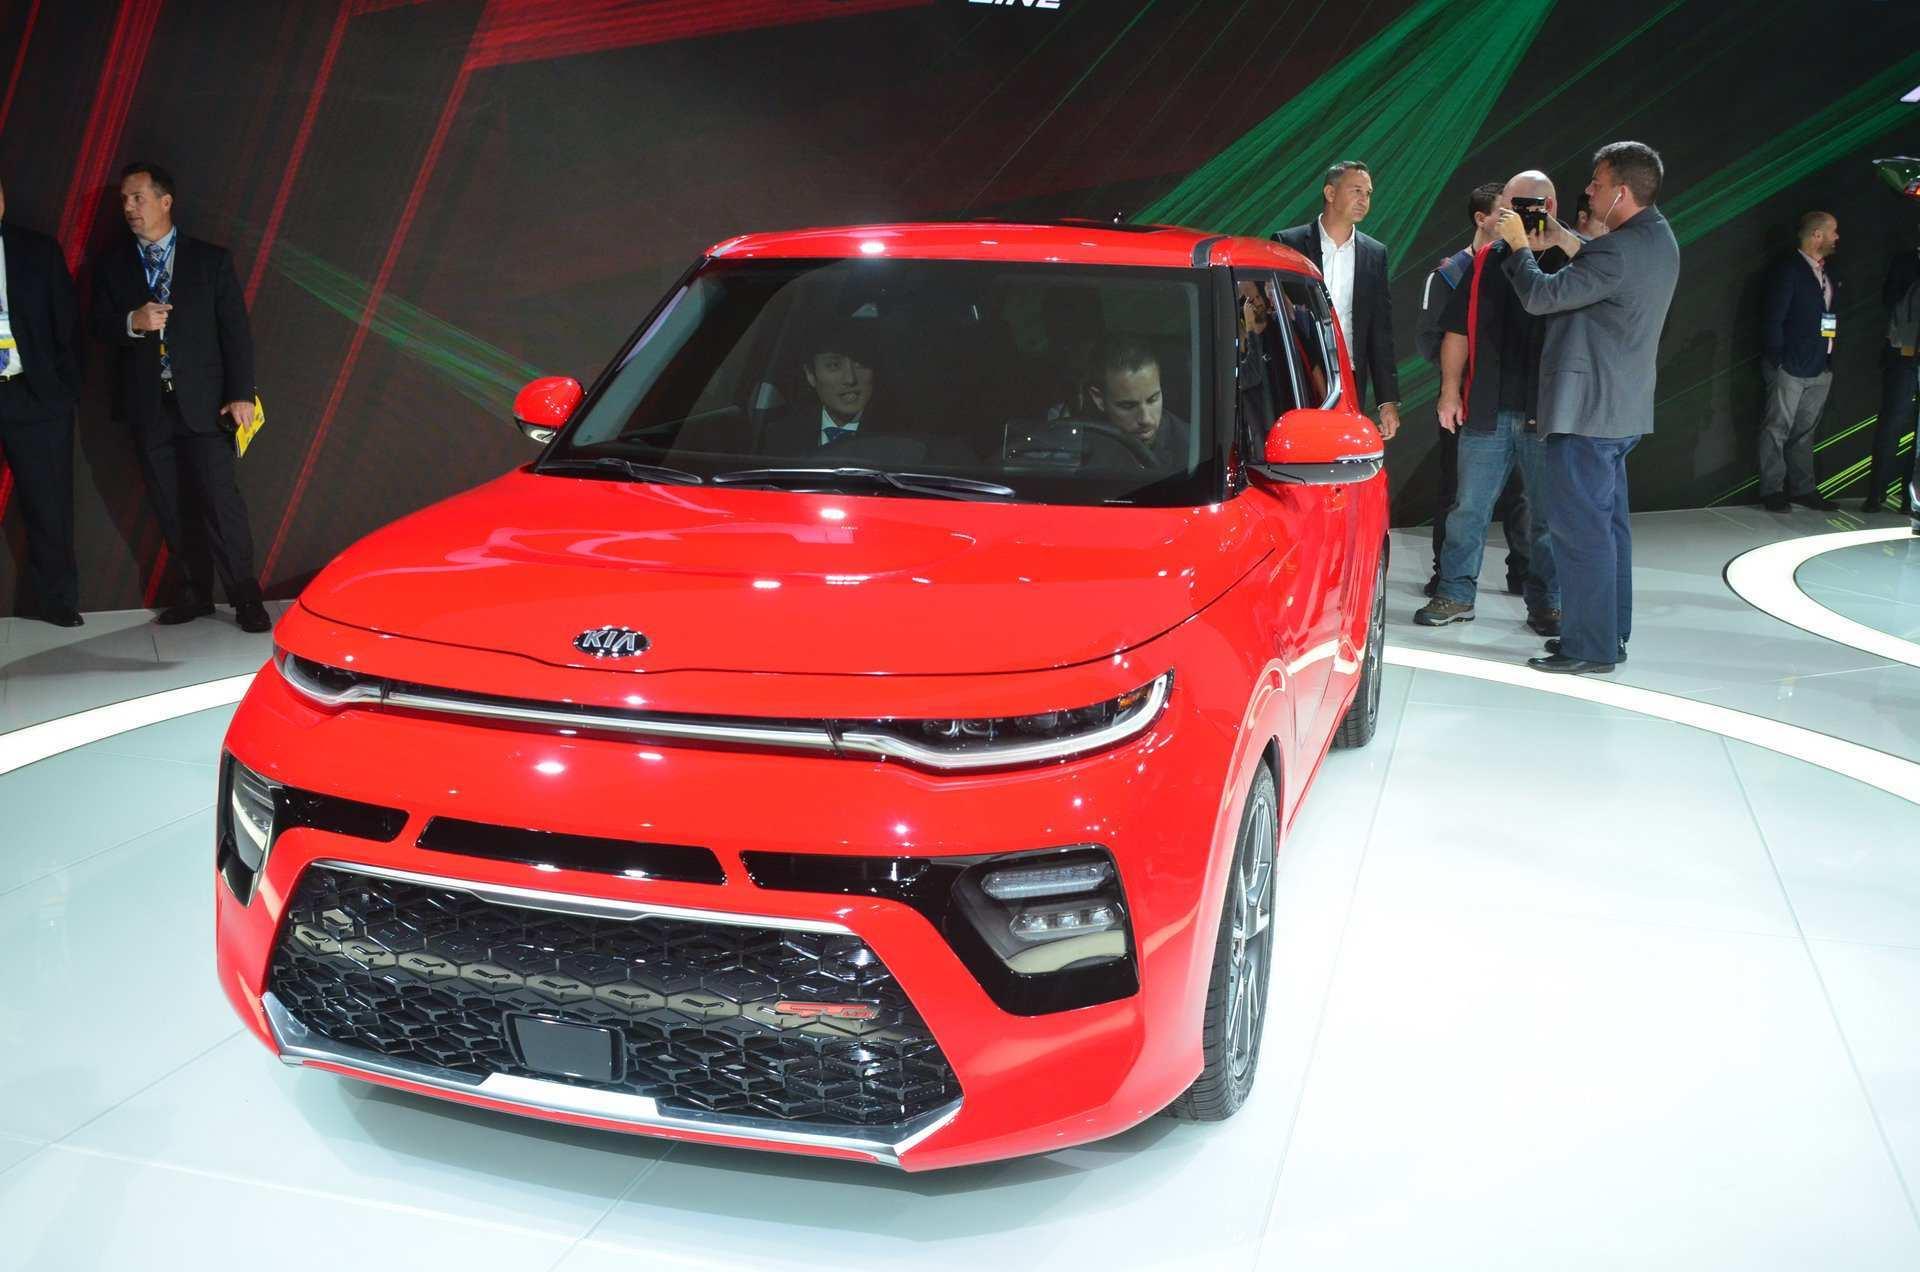 80 Concept of Xe Kia 2020 Performance by Xe Kia 2020